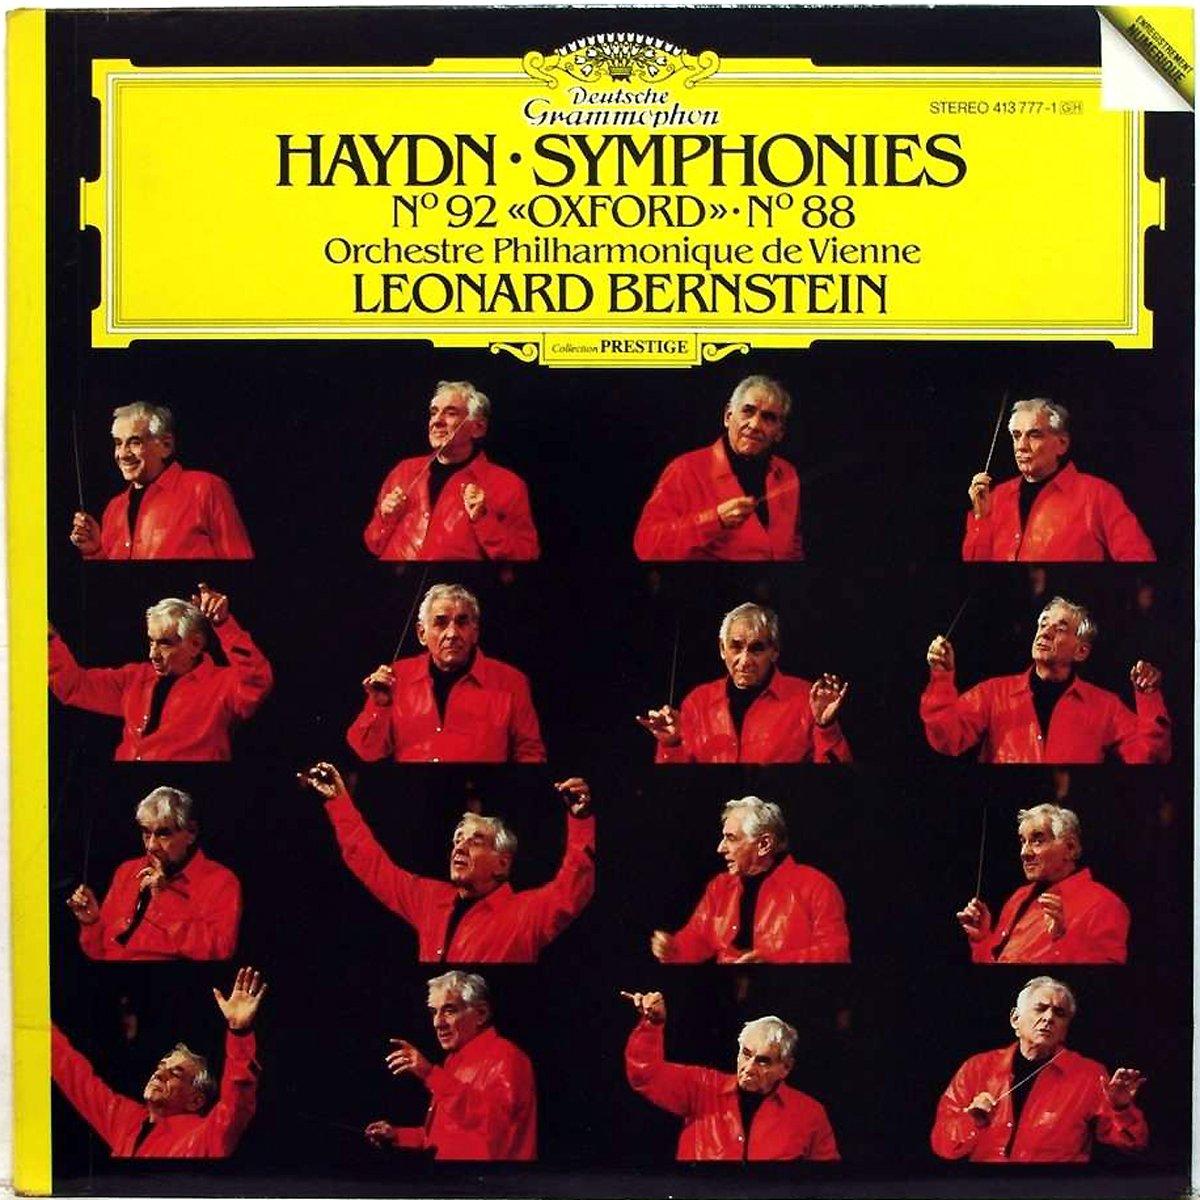 DGG 413777 Haydn Symphonies 92 88 Bernstein DGG Digital Aufnahme